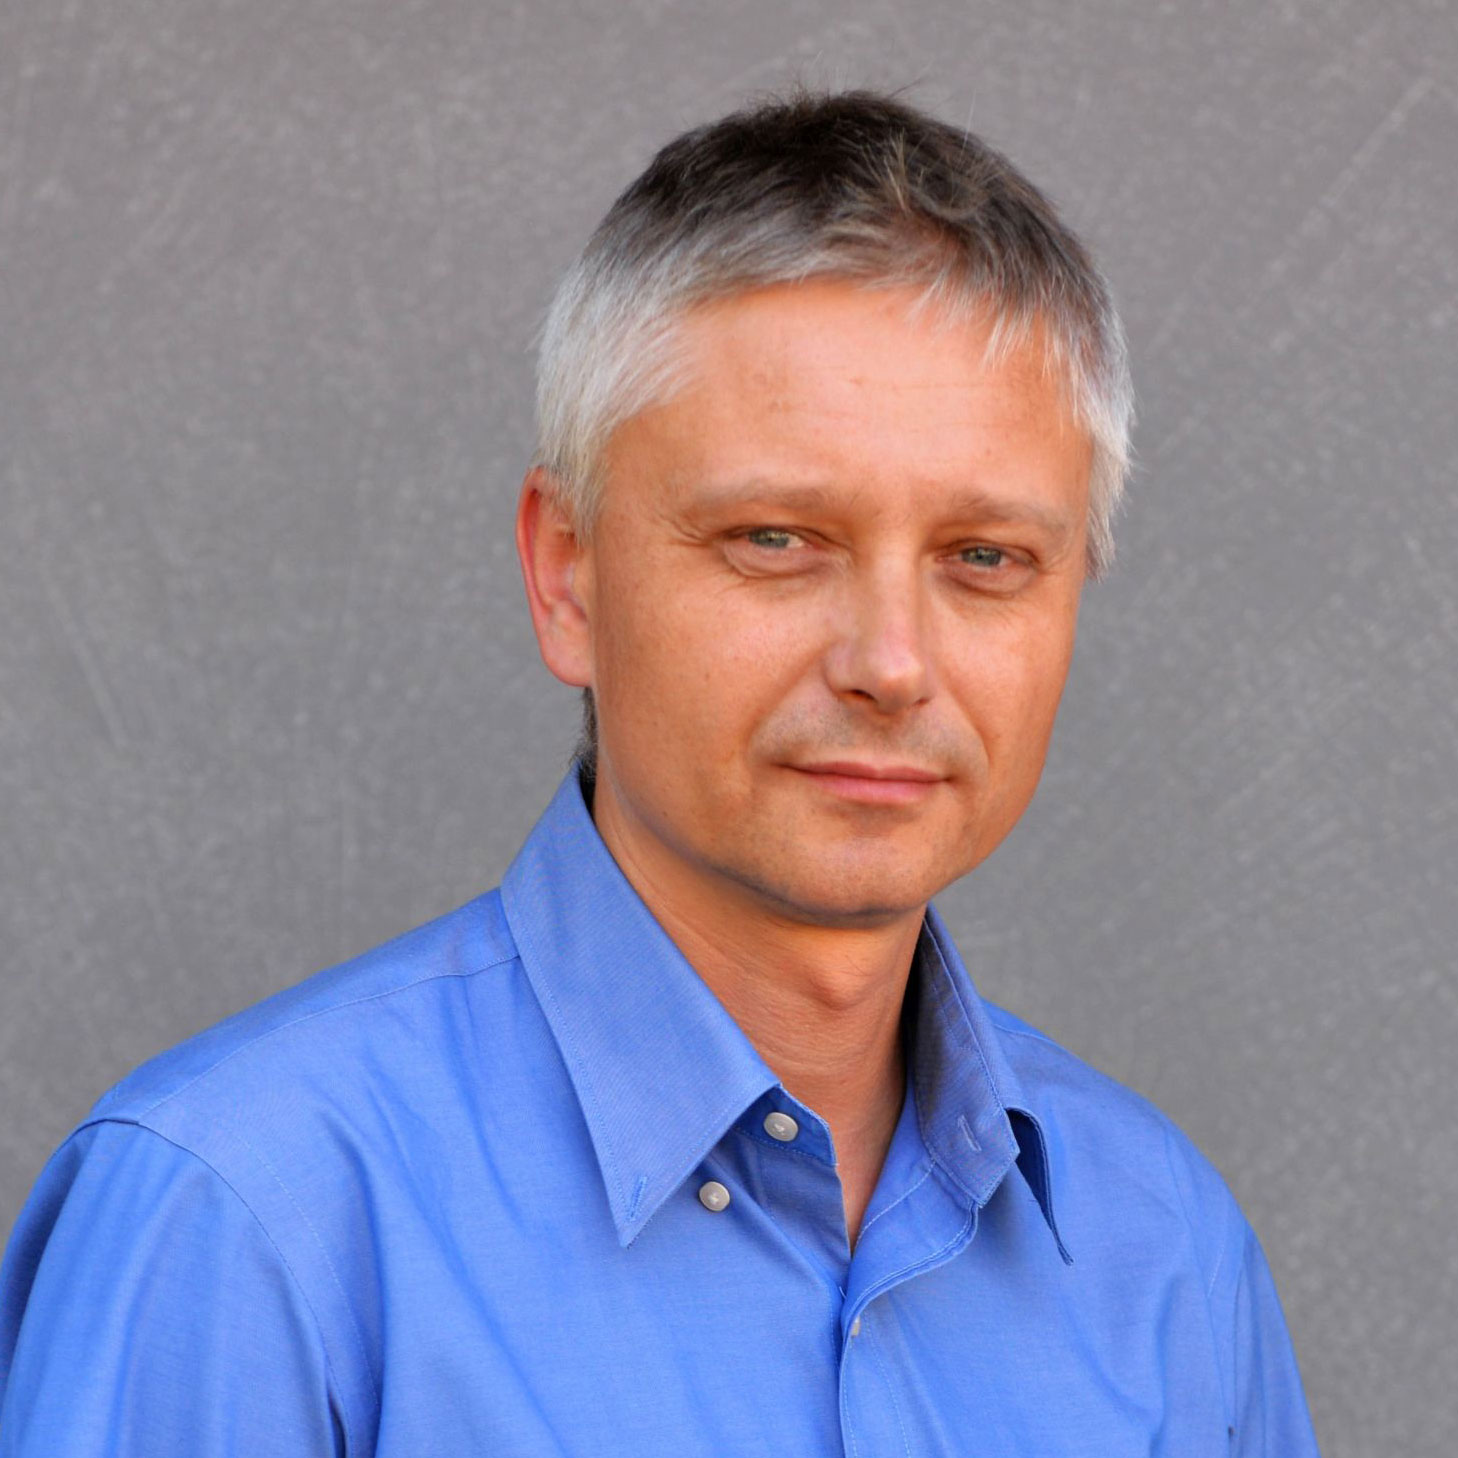 Ing. Tomáš Mocek, PhD.